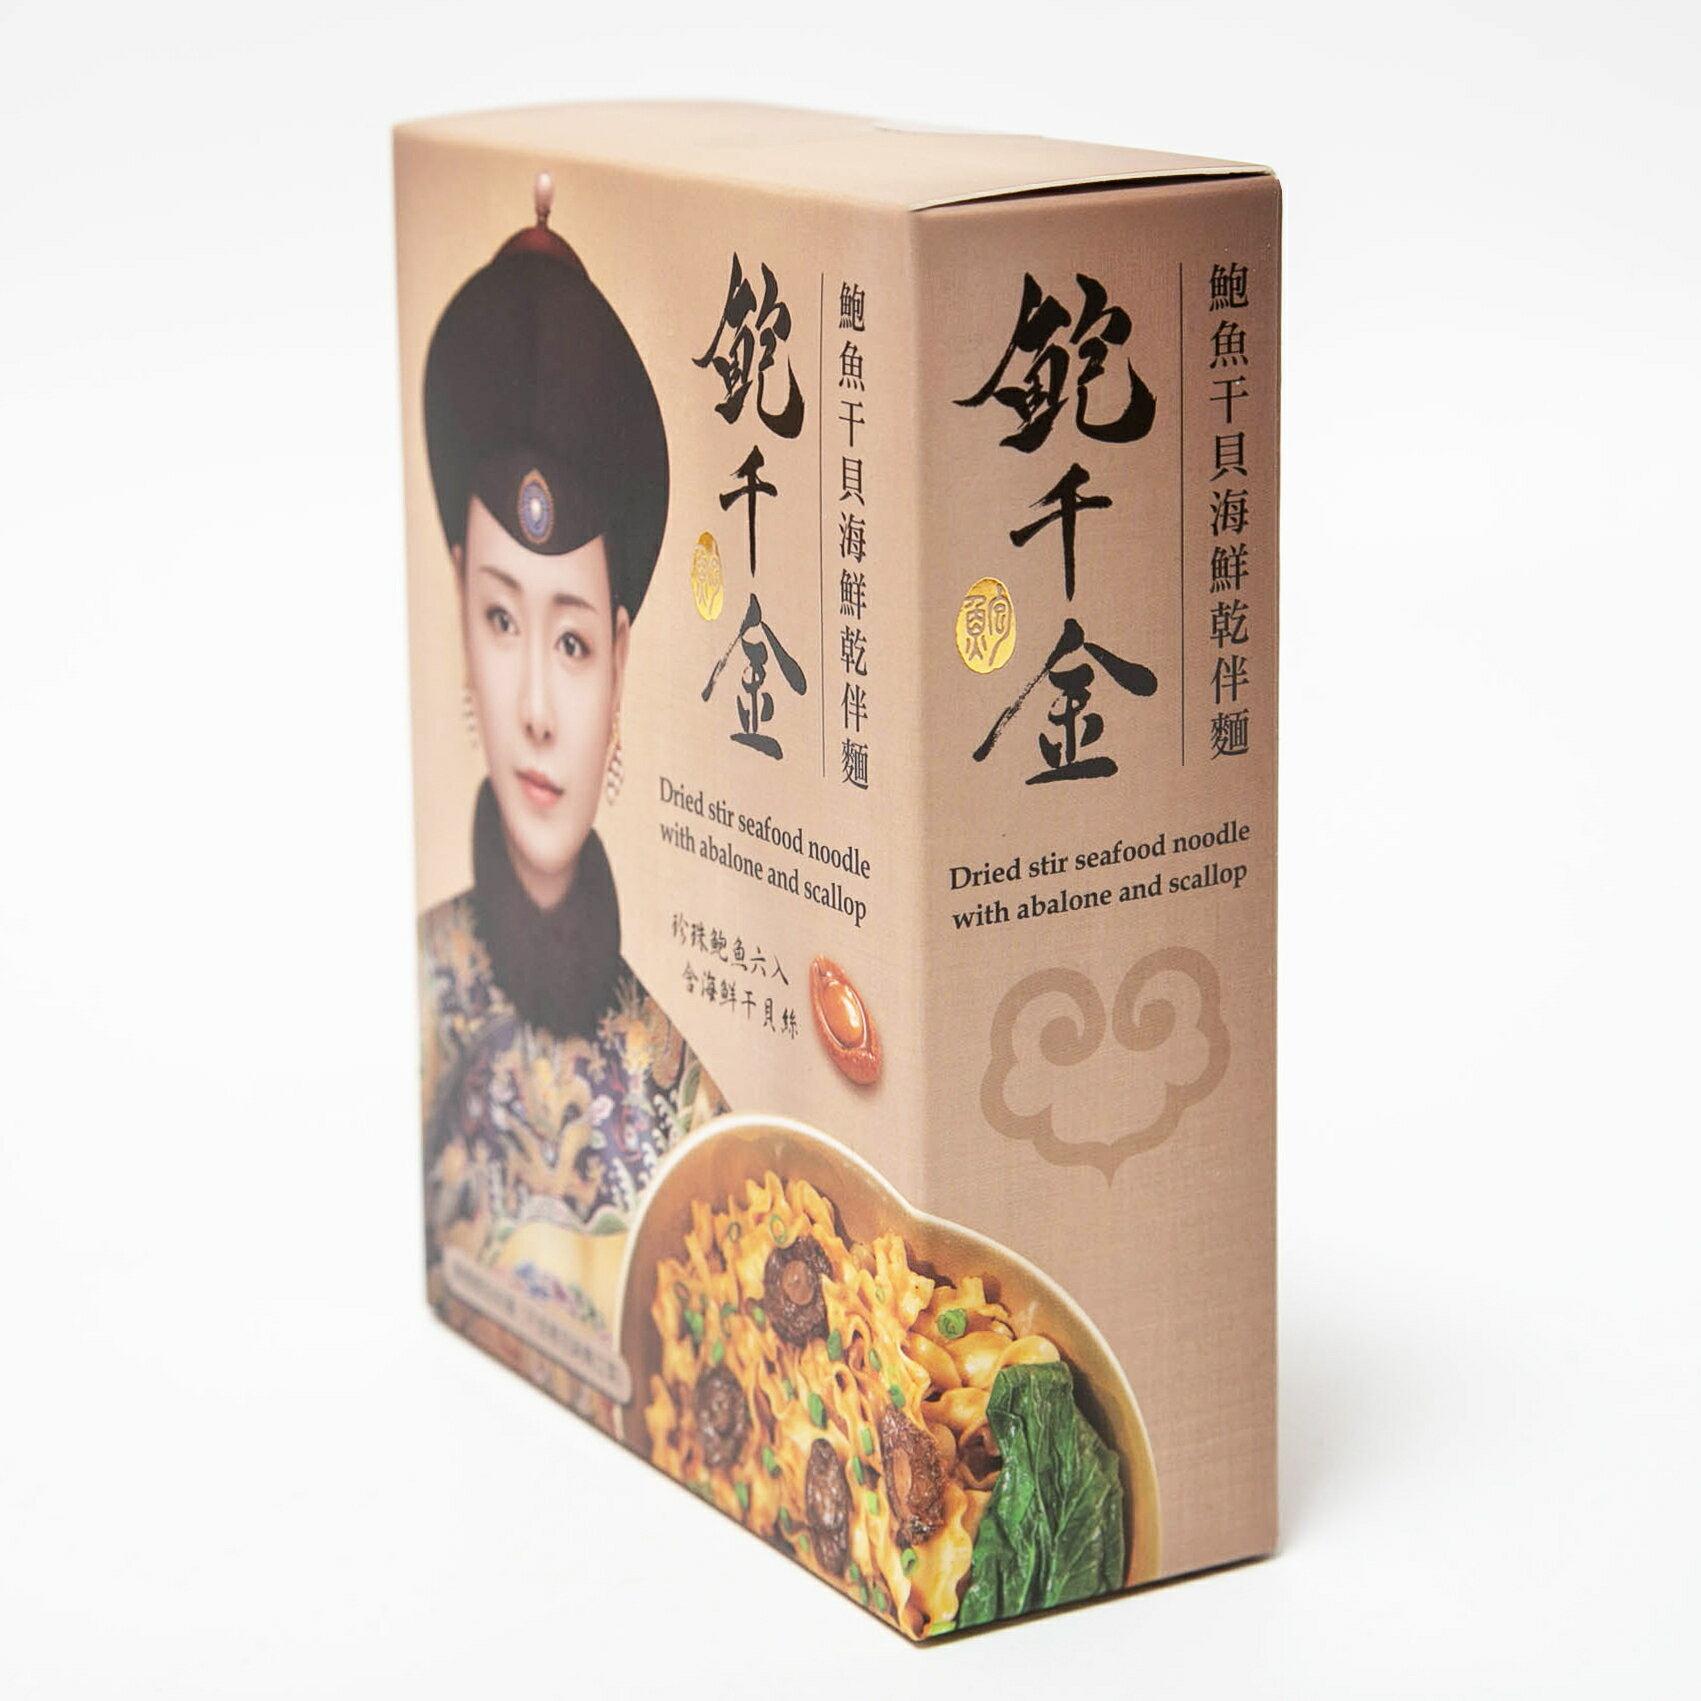 【APP滿666折50】鮑千金 鮑魚干貝海鮮乾拌麵(香辣)一箱12盒入 1